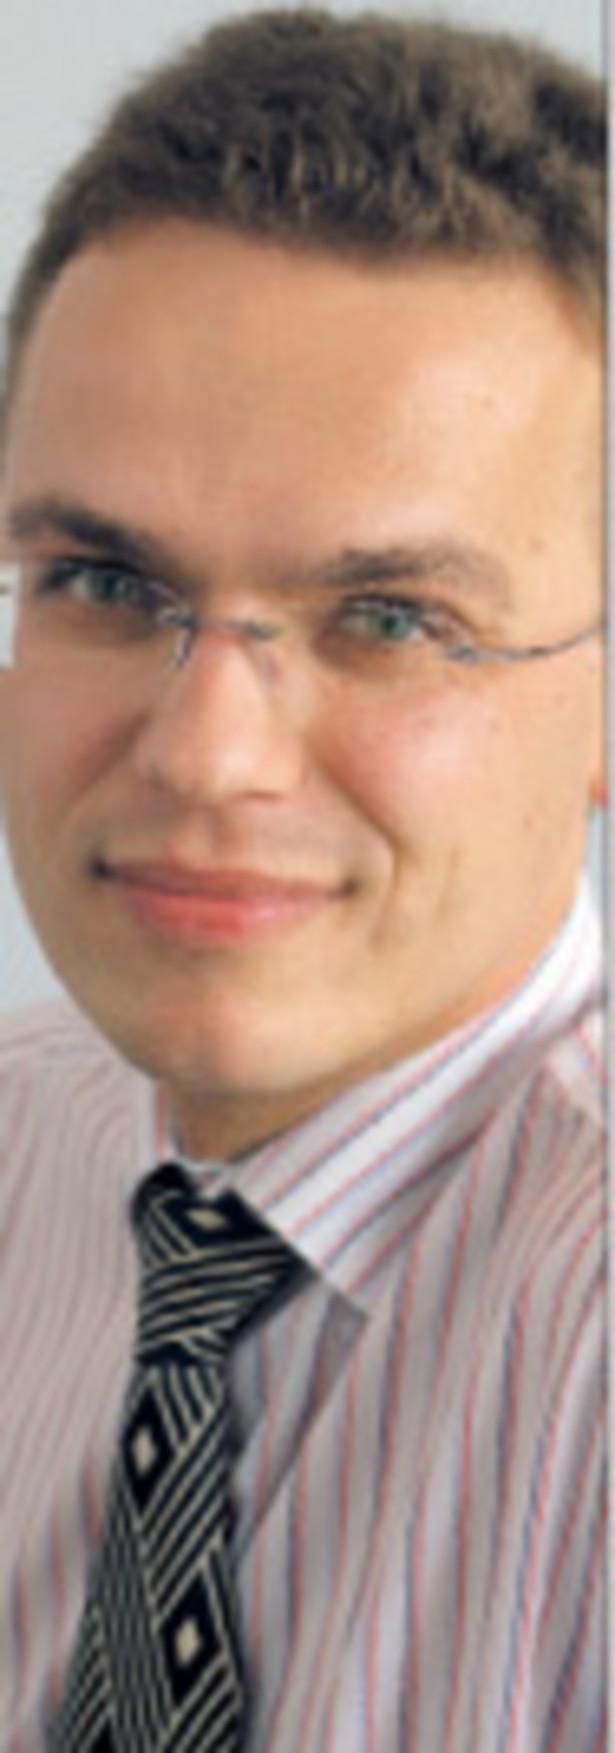 Waldemar Jurasz, Delegatura UOKiK w Krakowie